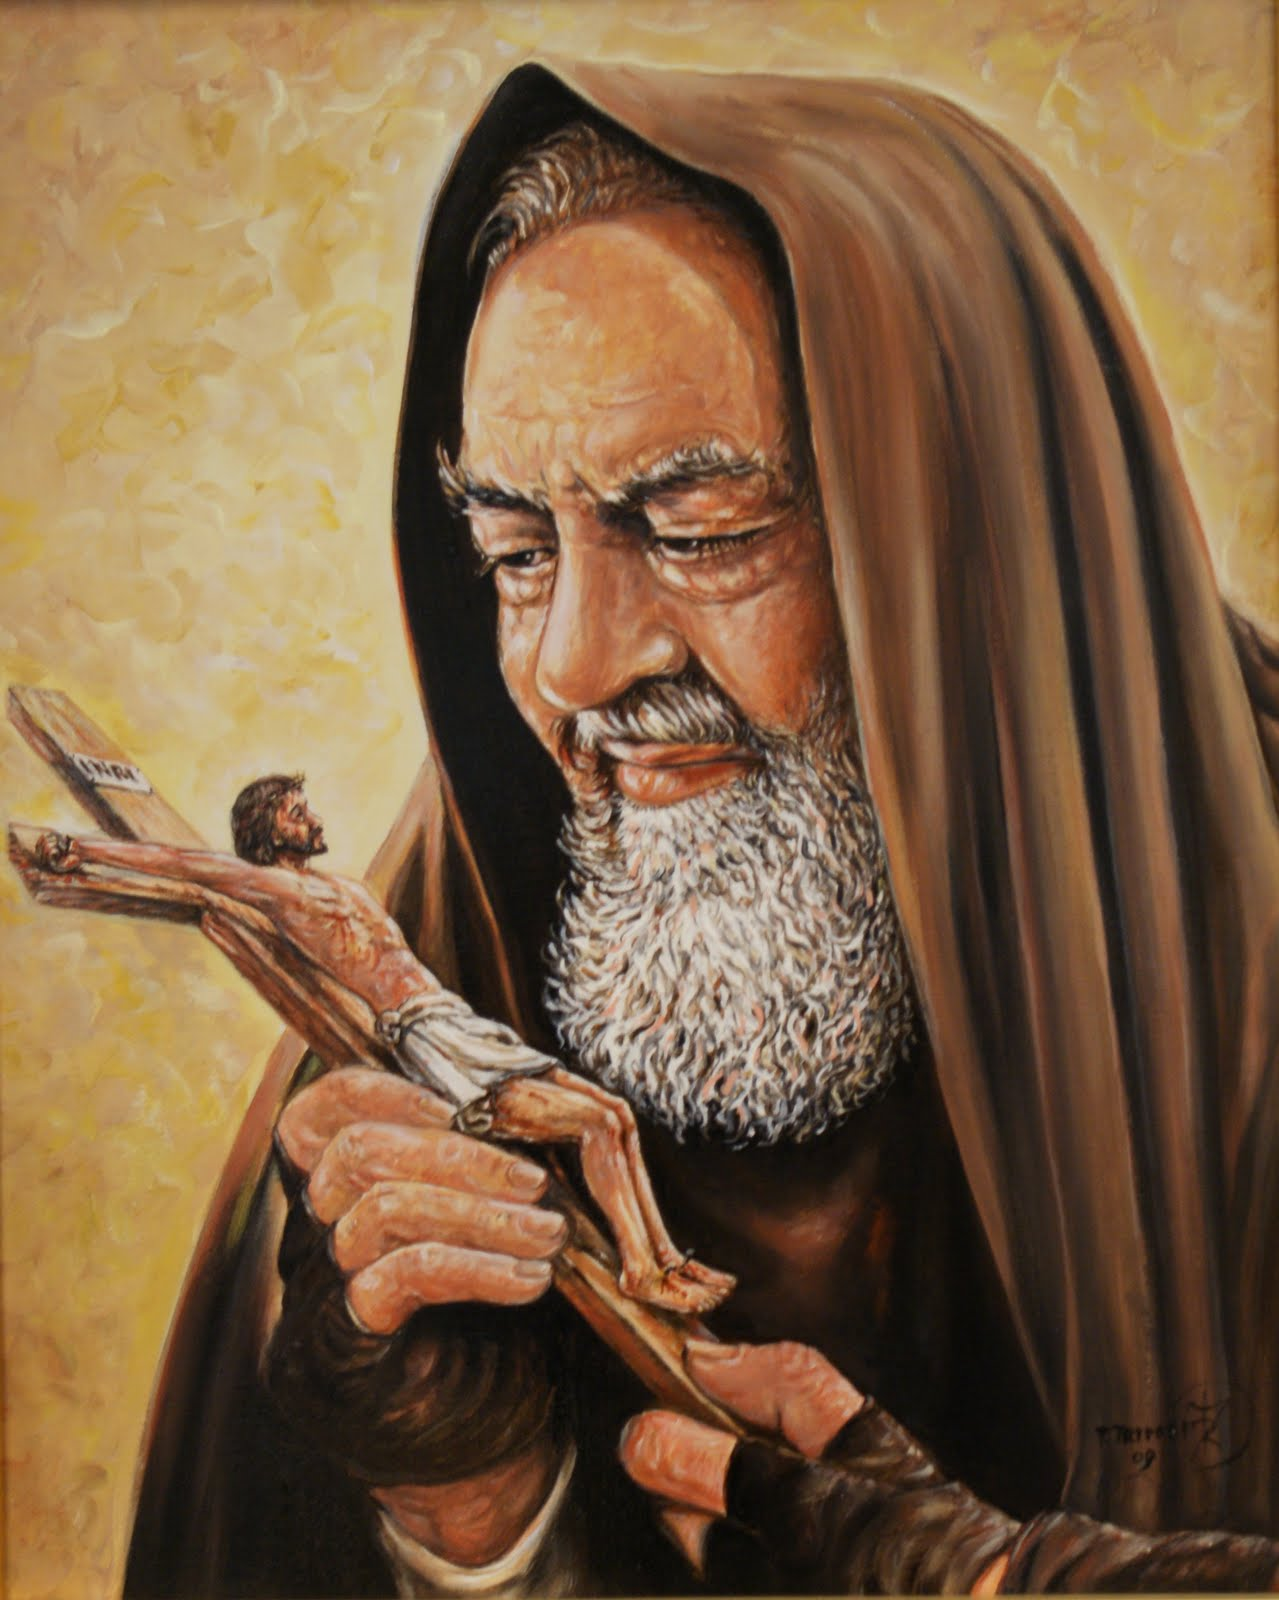 99c7b2fb6e9 Church Exorcist Q&A: Padre Pio - St Michael Catholic Radio